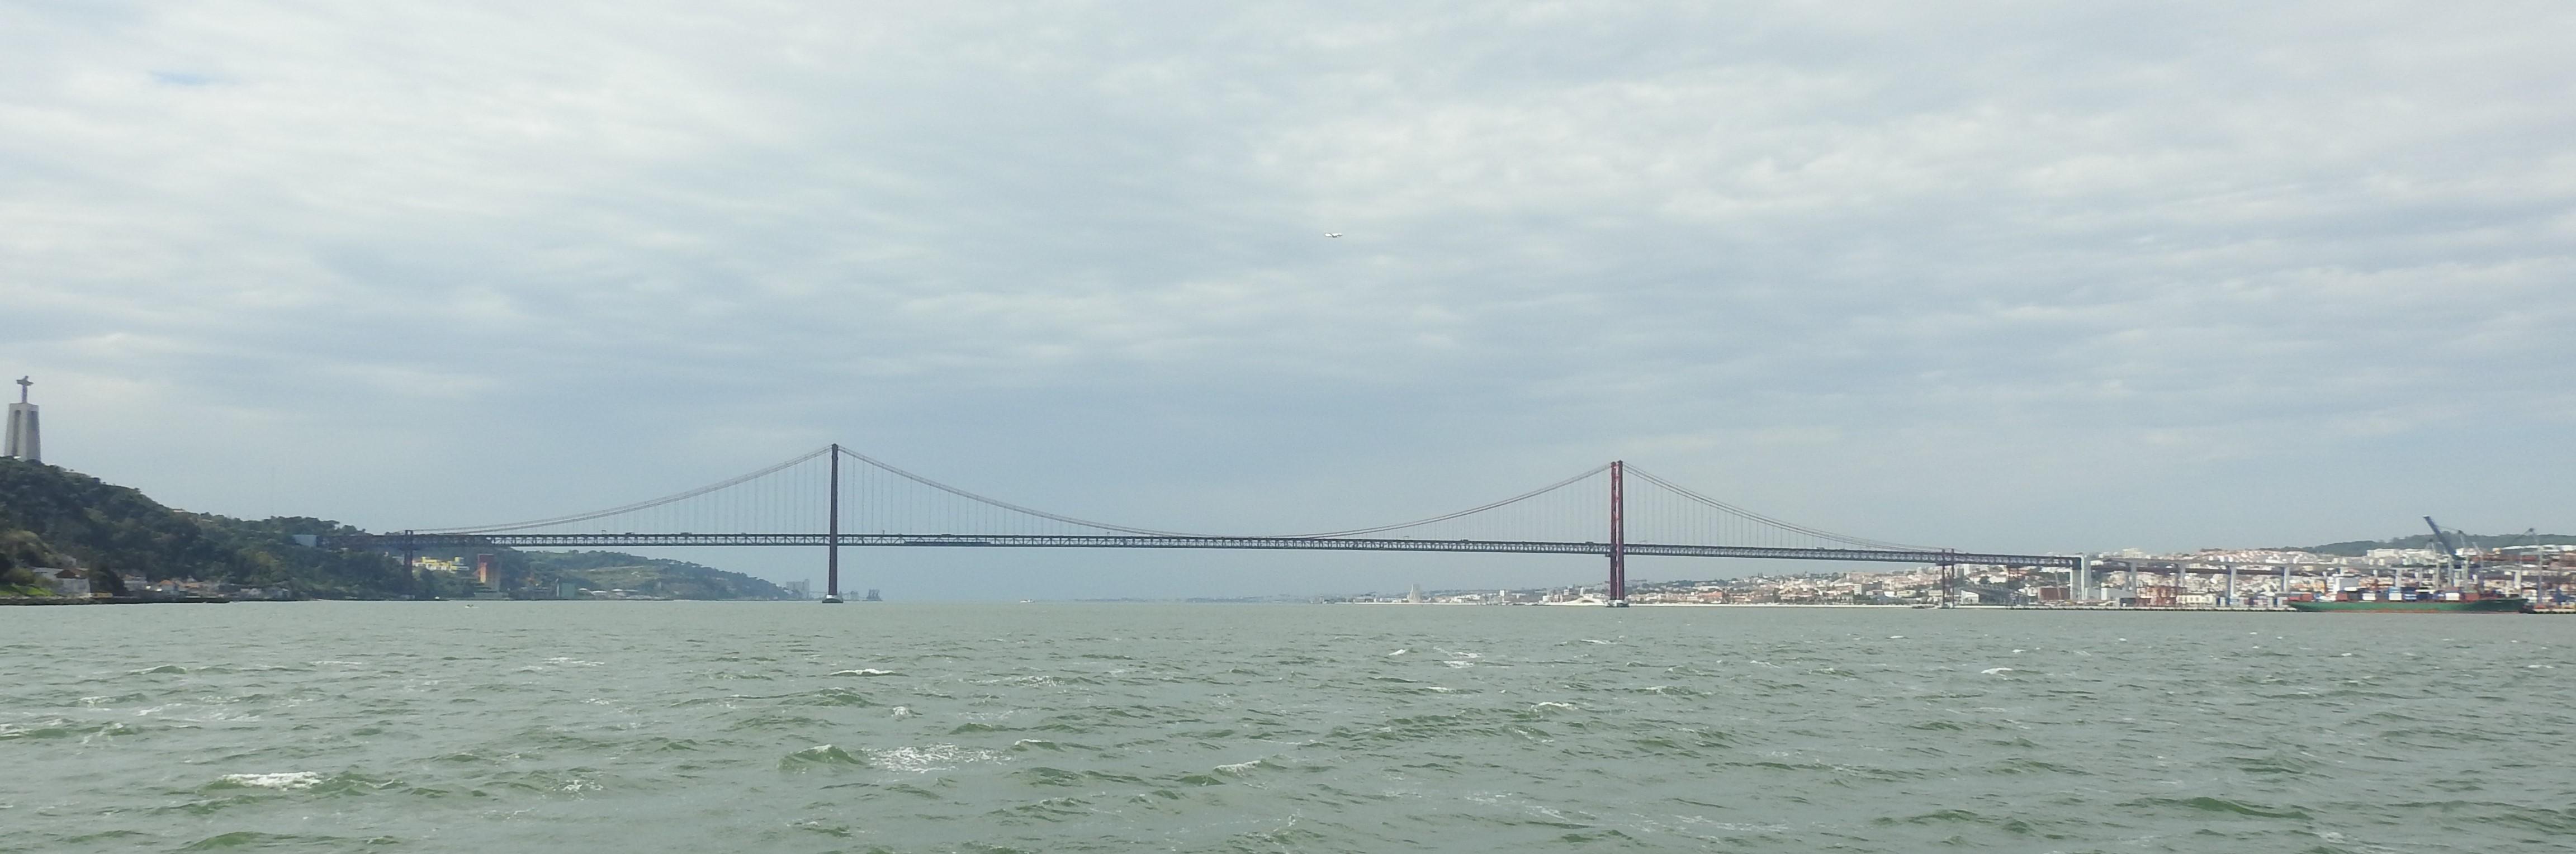 Crossing the longest river in the Iberian Peninsula